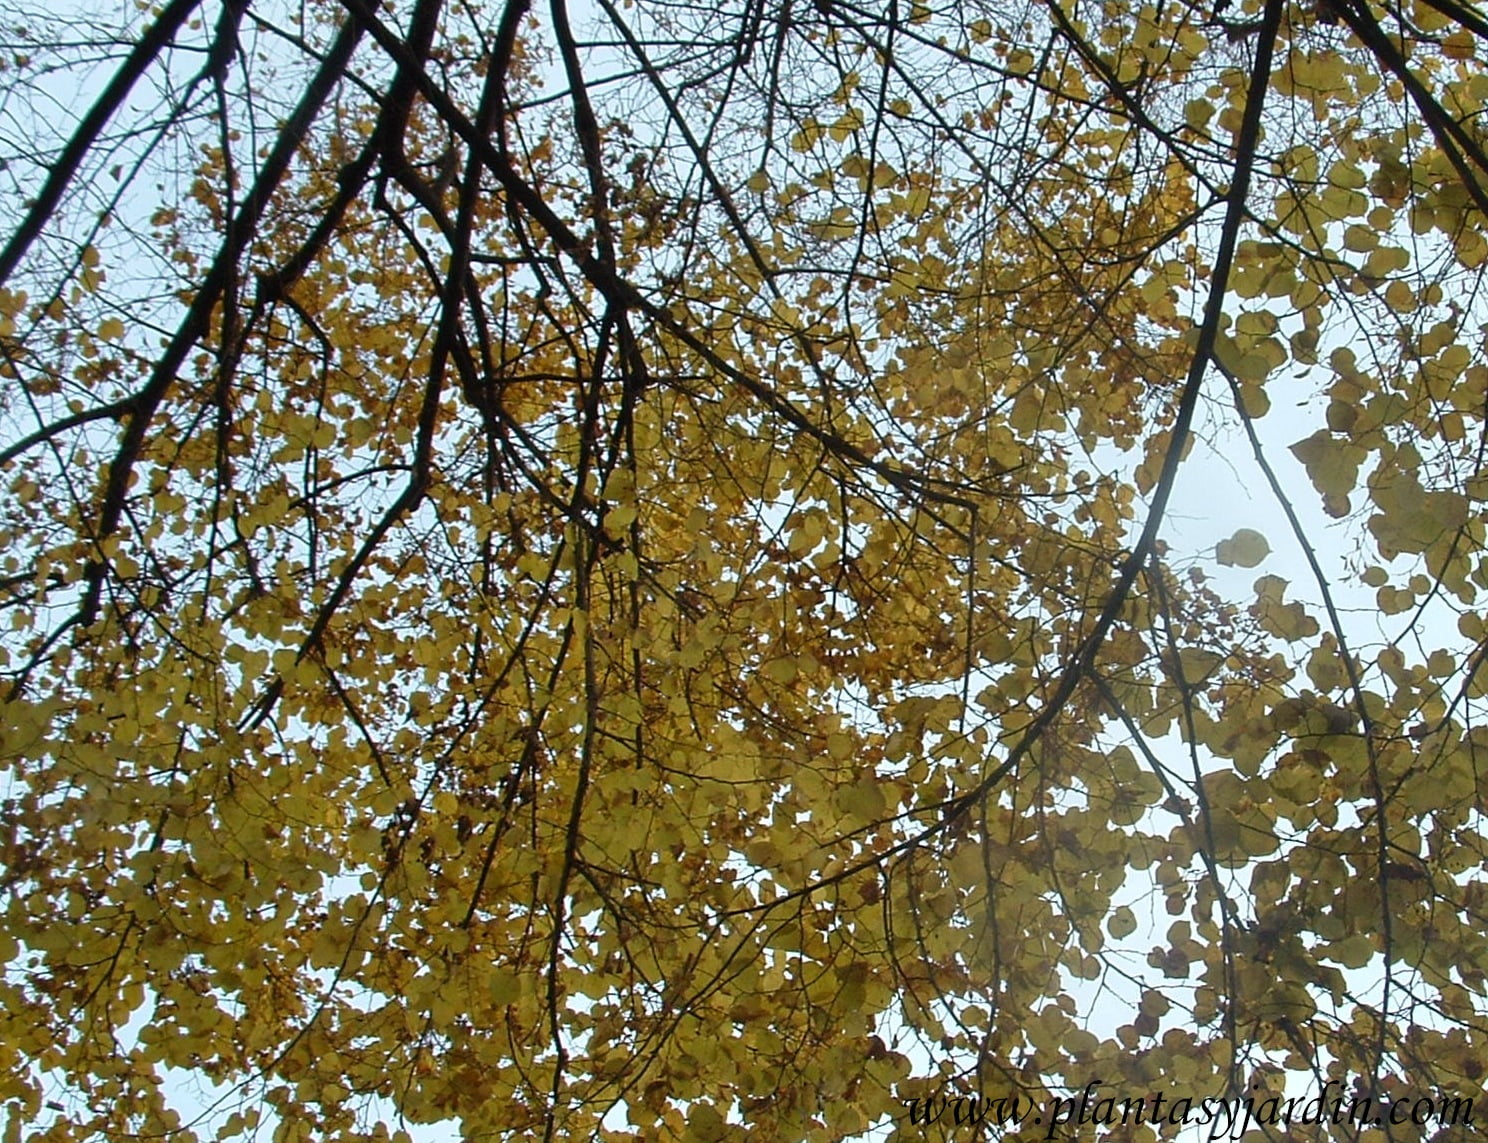 Tilia platyphyllos-Tilo, detalle de follaje color otoñal.